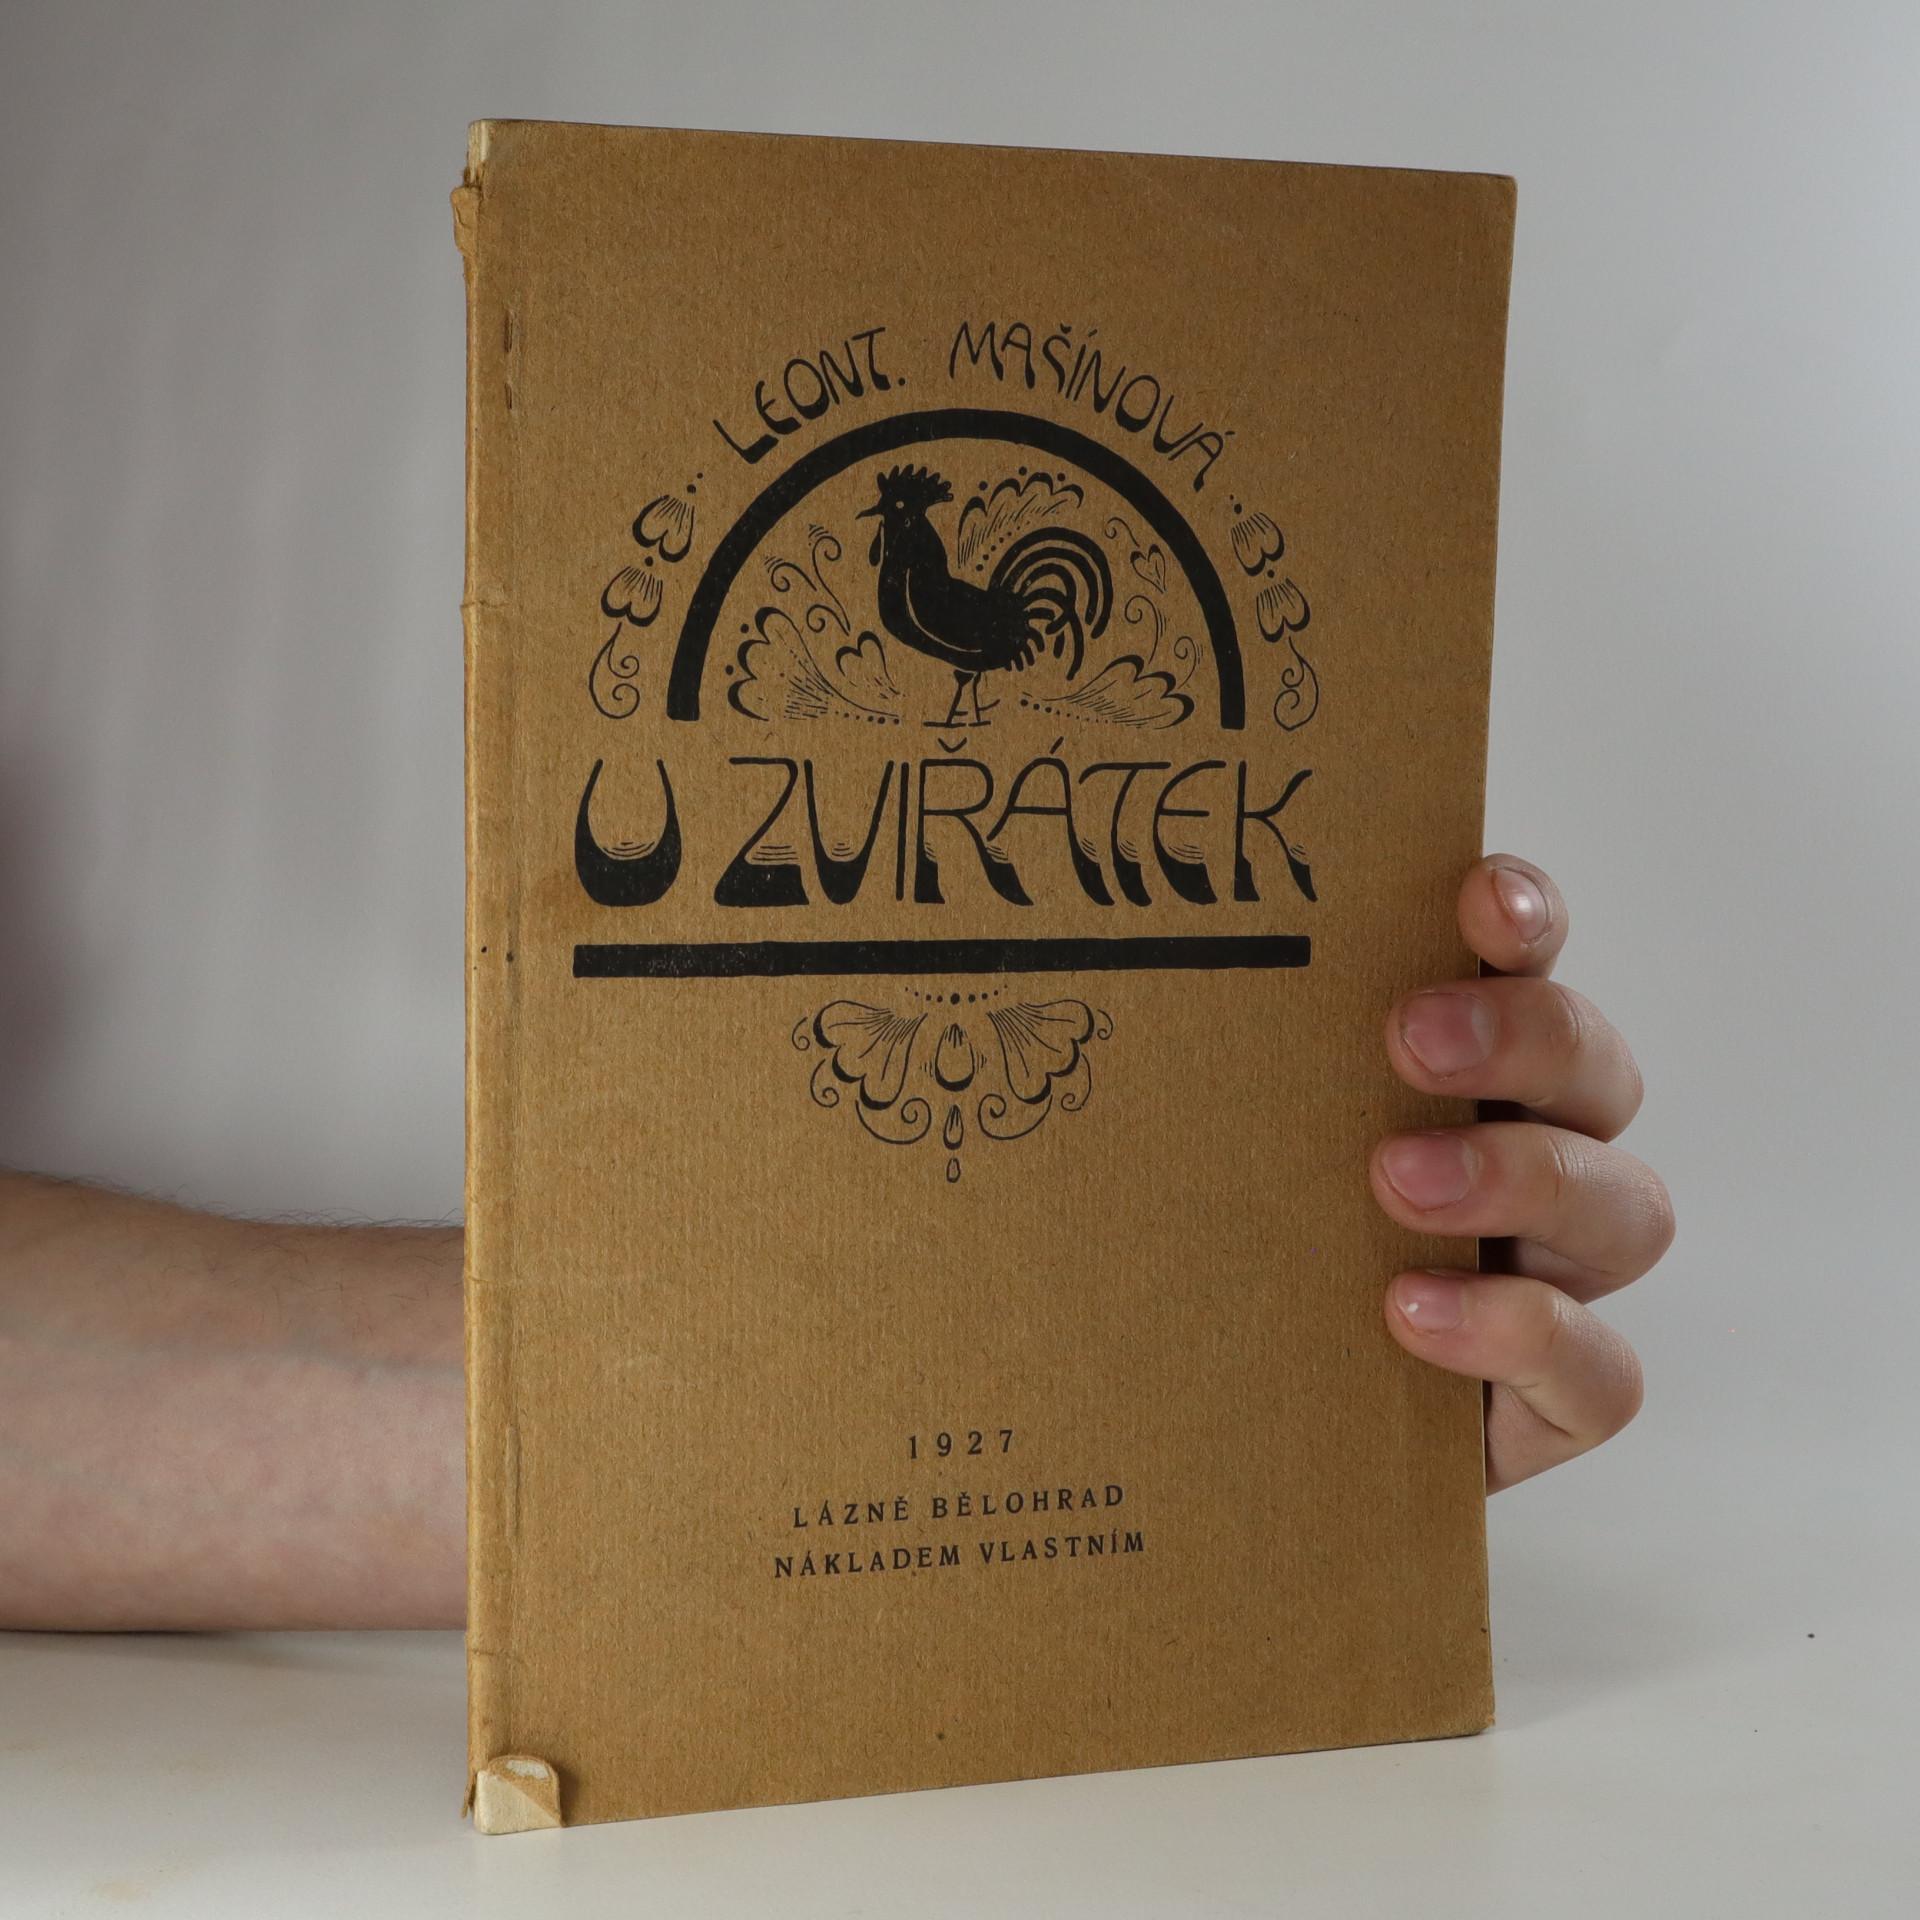 antikvární kniha U zvířátek, 1927